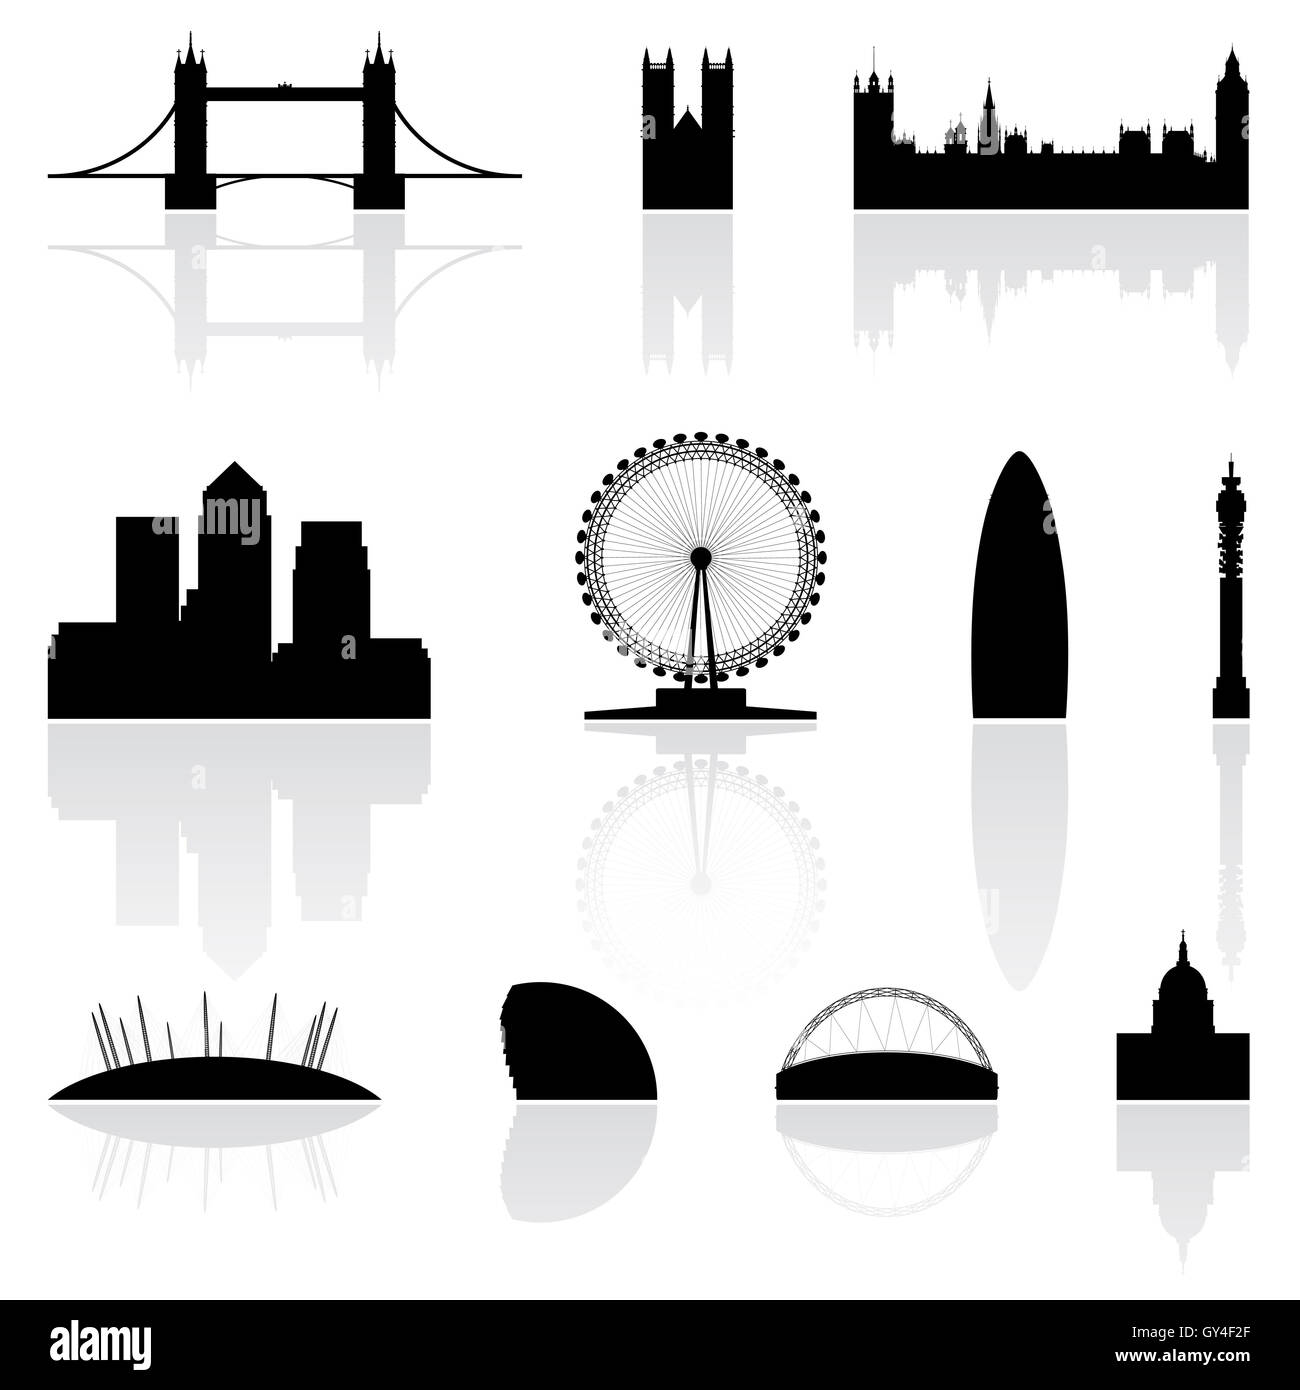 London famous landmarks isolated on a white background - Stock Image